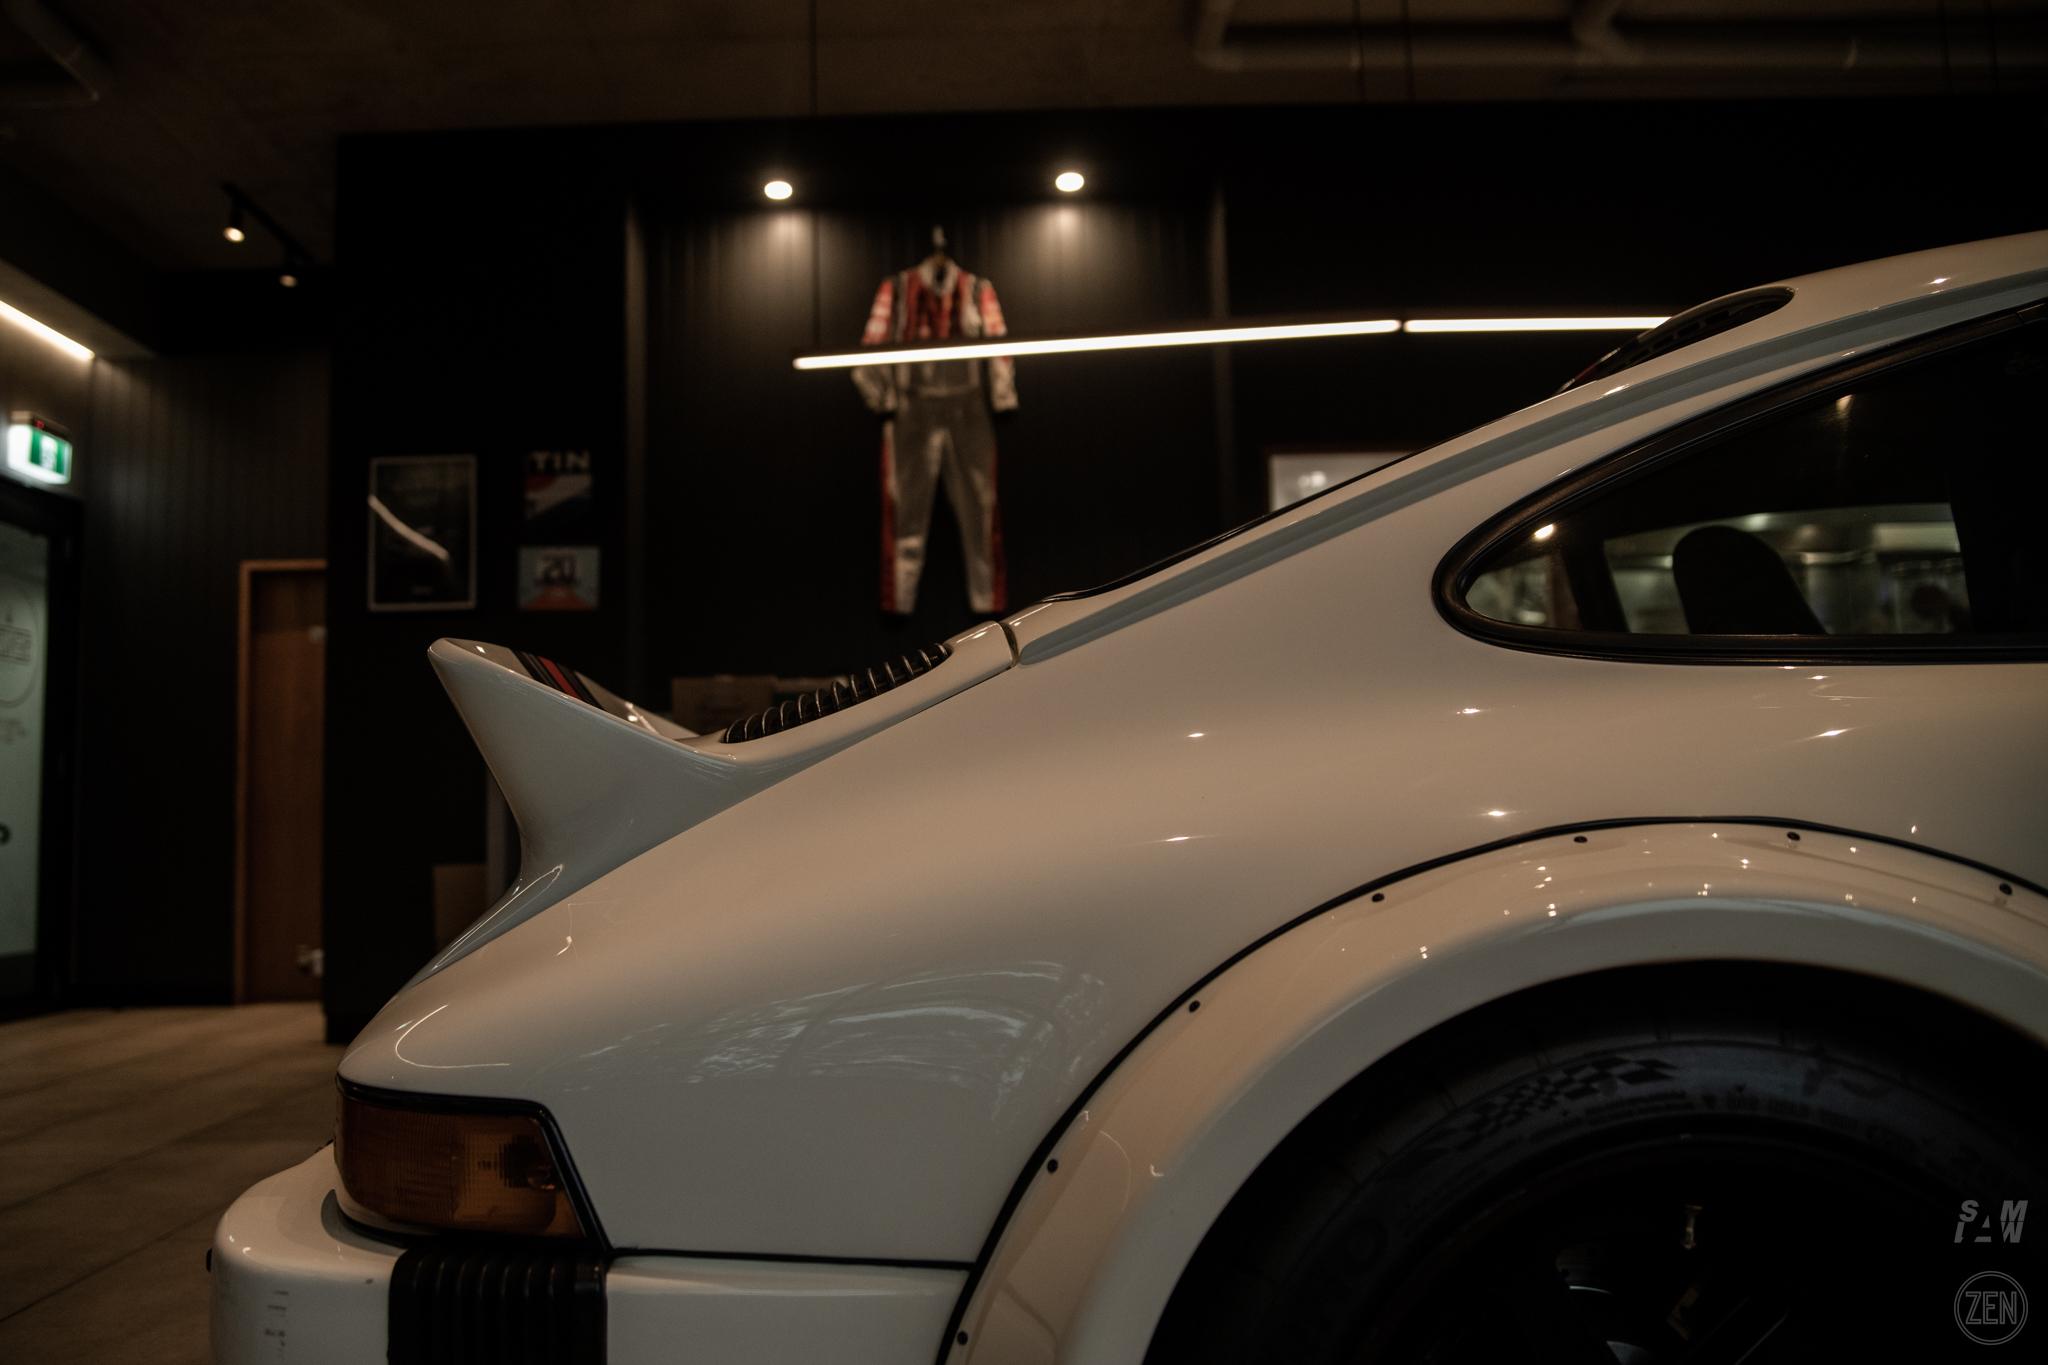 2021-02-27 - Benzin x Autohaus Grp 4 004